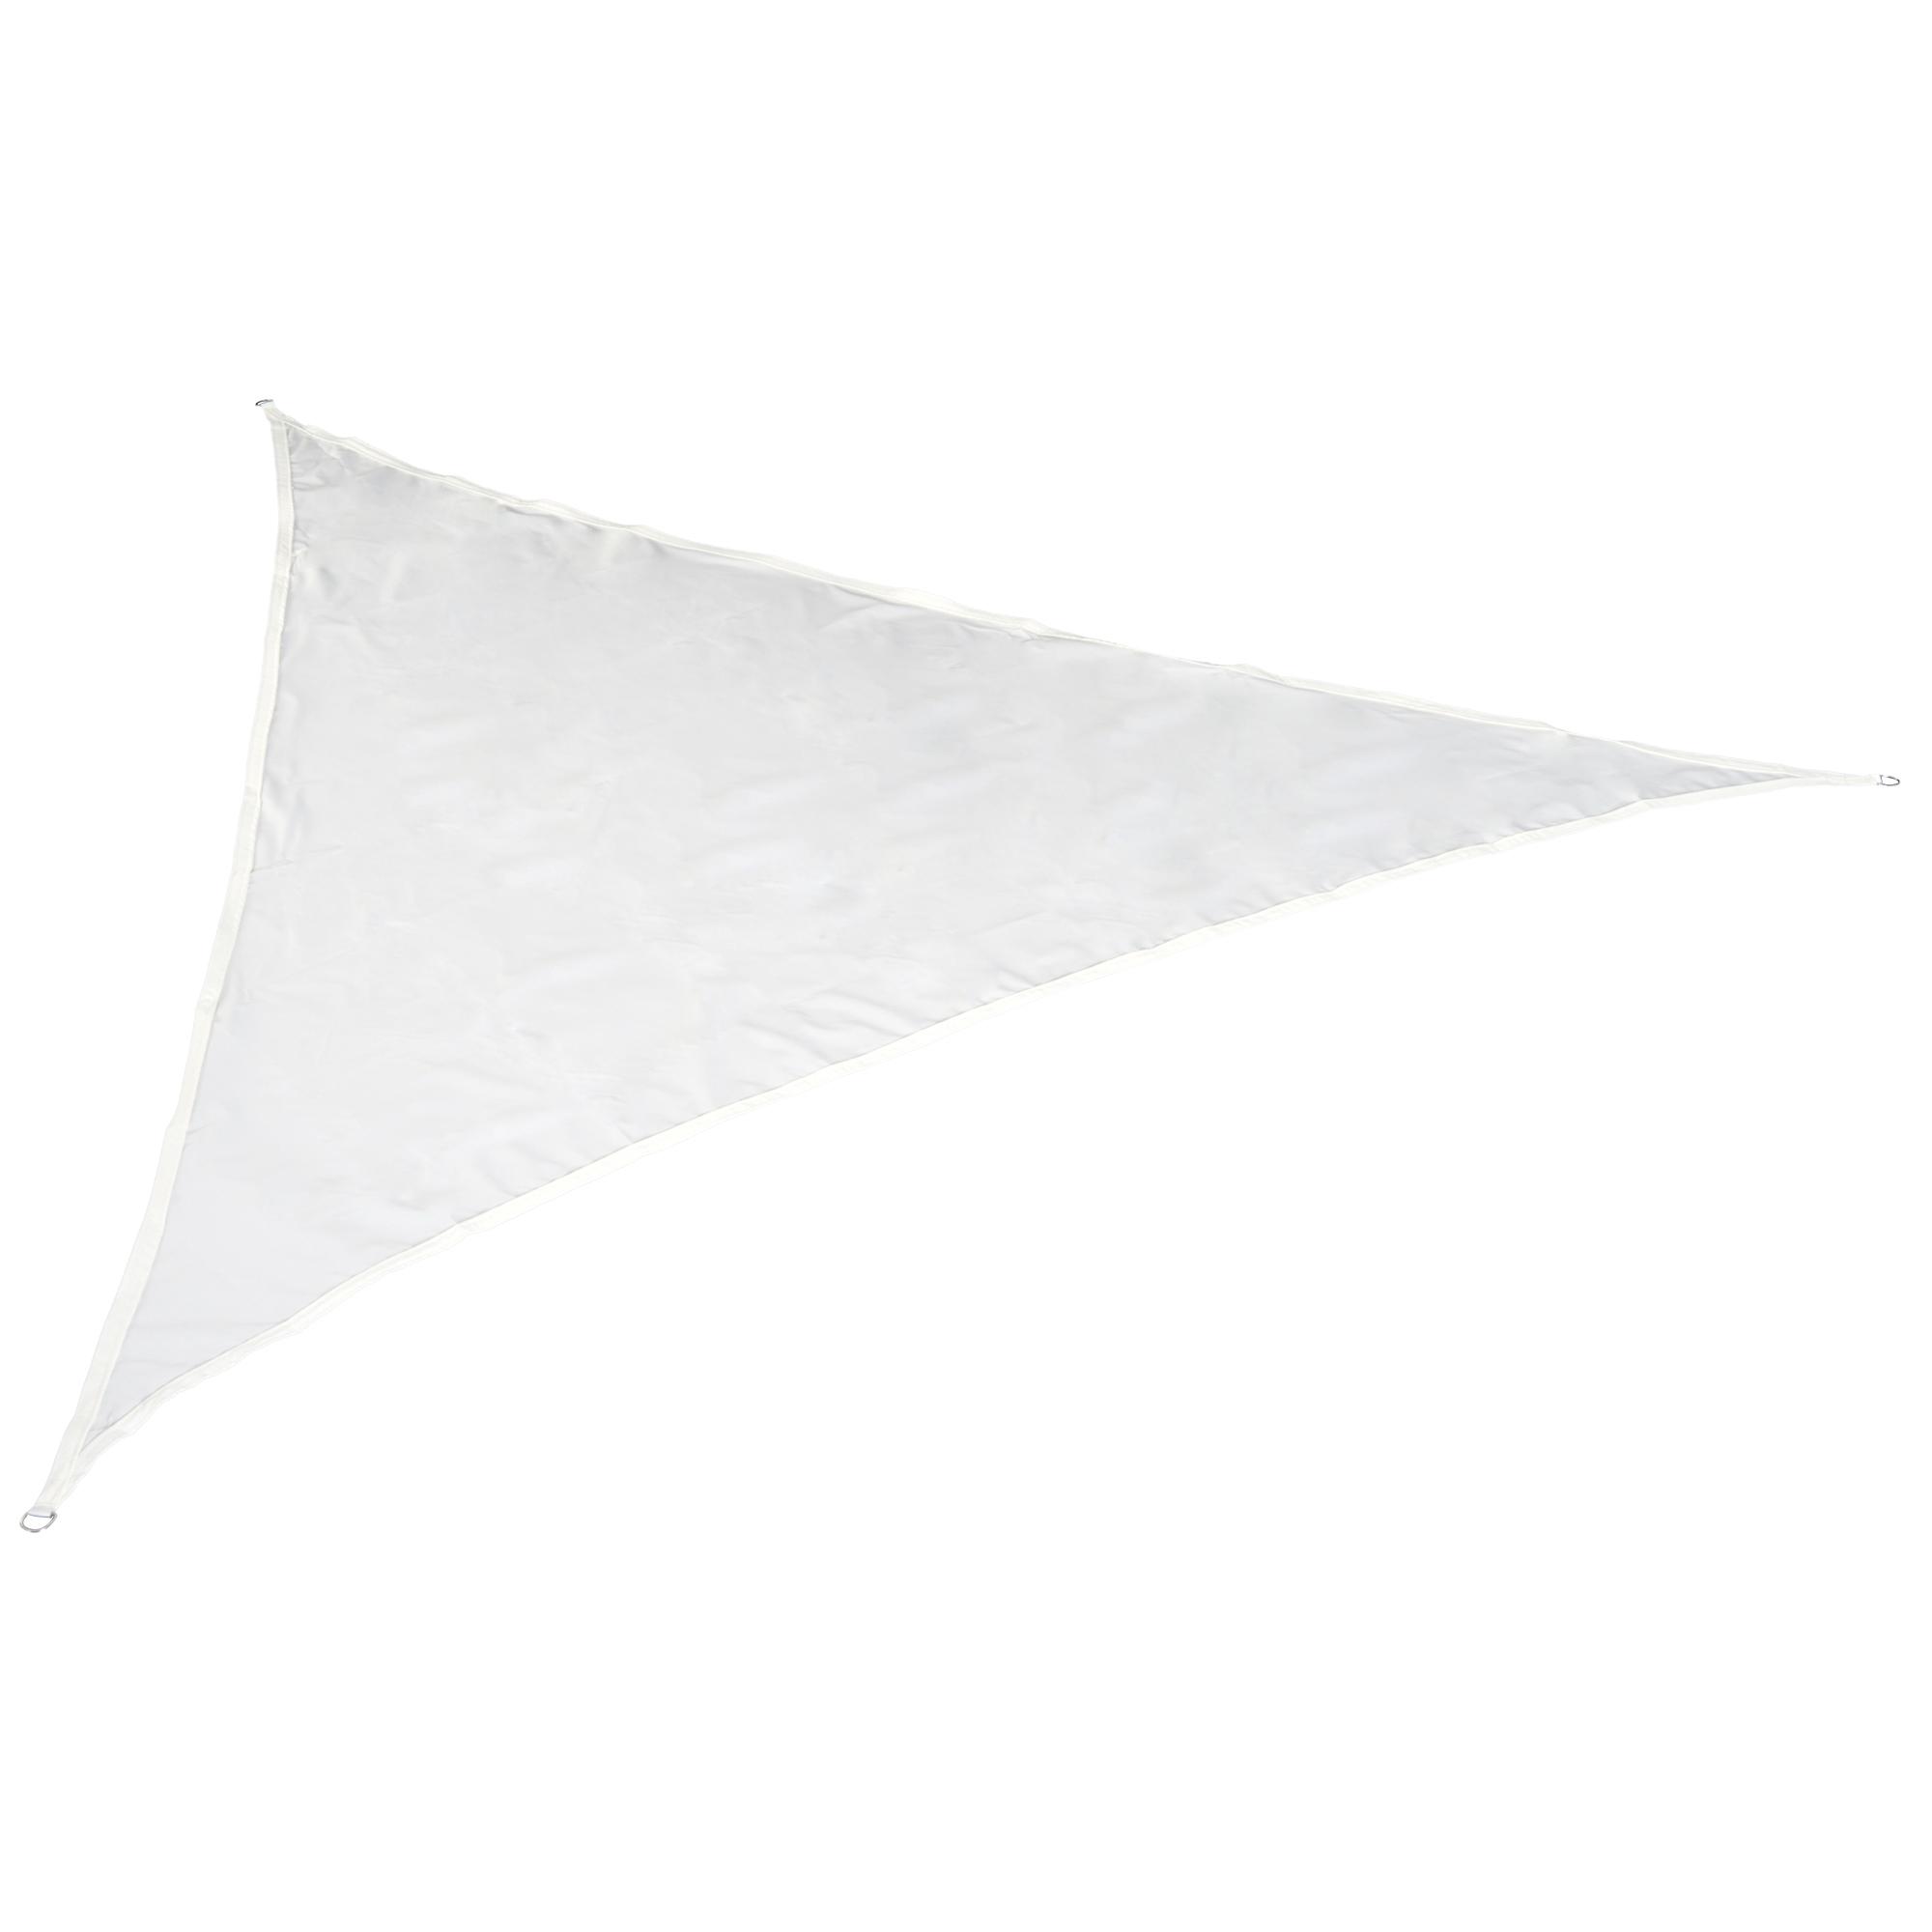 Toldo-Vela-Sombrilla-Parasol-Triangulo-Tejido-de-Poliester-160g-m2-Jardin-Playa miniatura 19